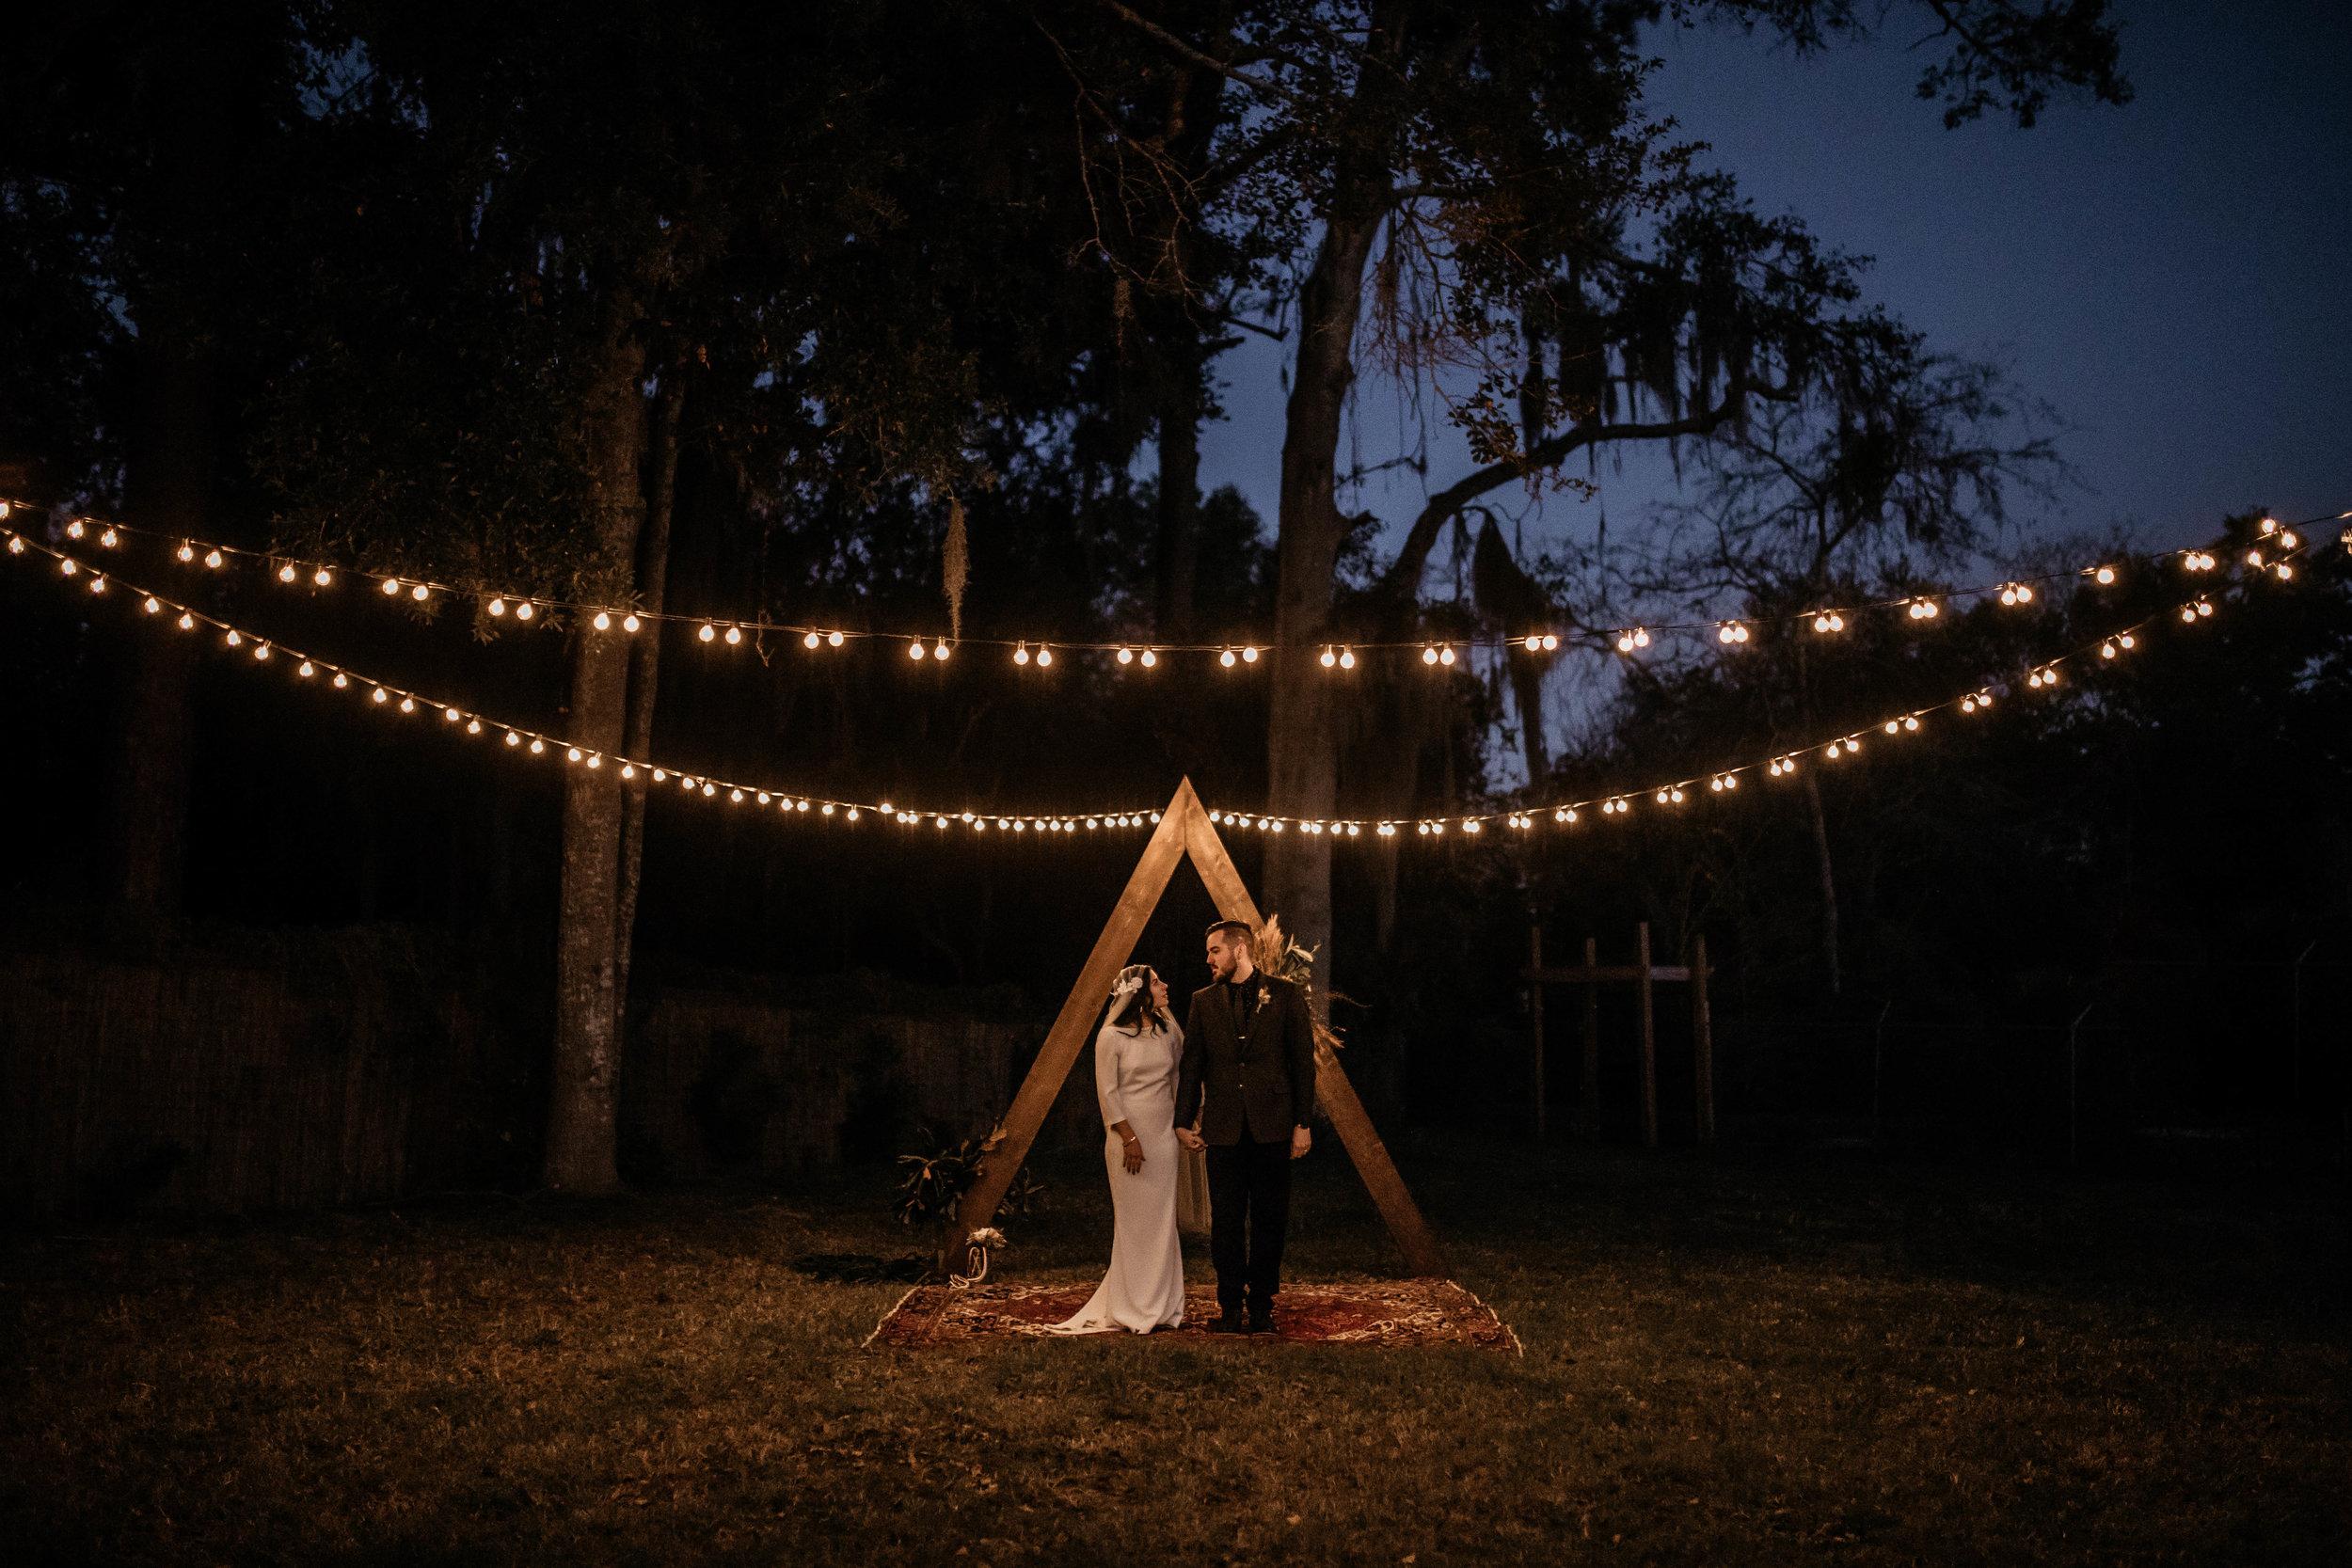 Outdoor Night Bride & Groom Photos | American Traditional Tattoo Themed Eco Friendly Dark Florida Wedding